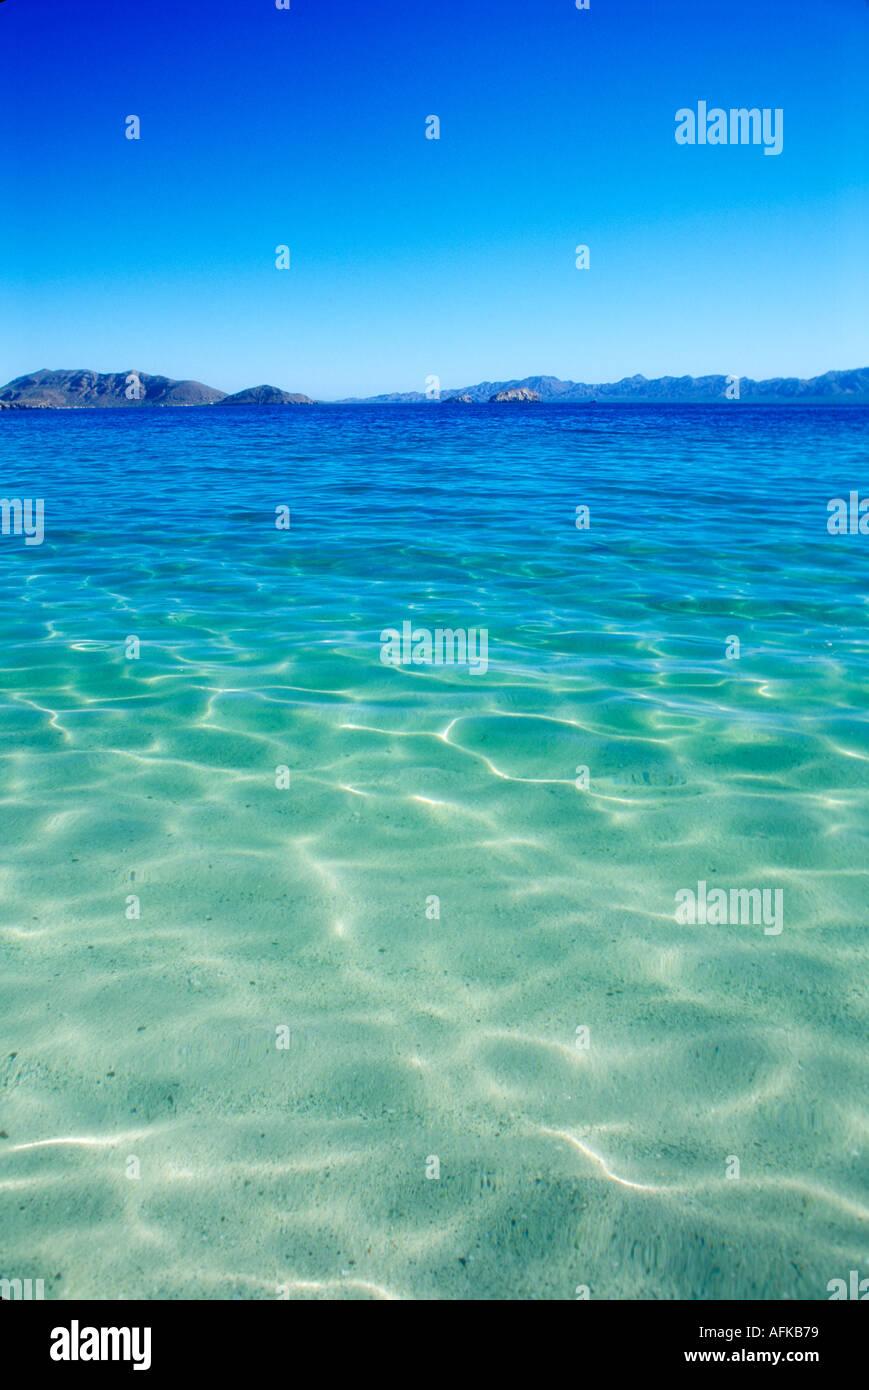 Clear shallow water near Bahia Concepcion in the Sea of Cortez Baja California Mexico Stock Photo